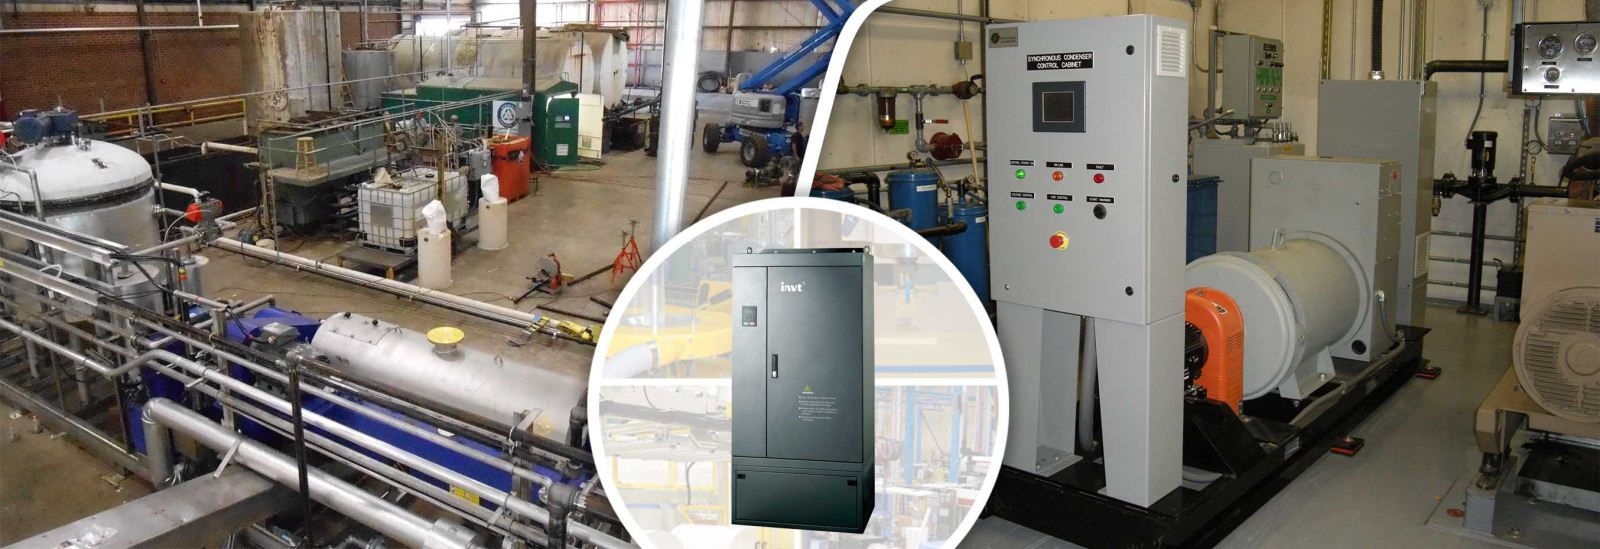 cảm biến áp suất 4-20mA điều khiển biến tần